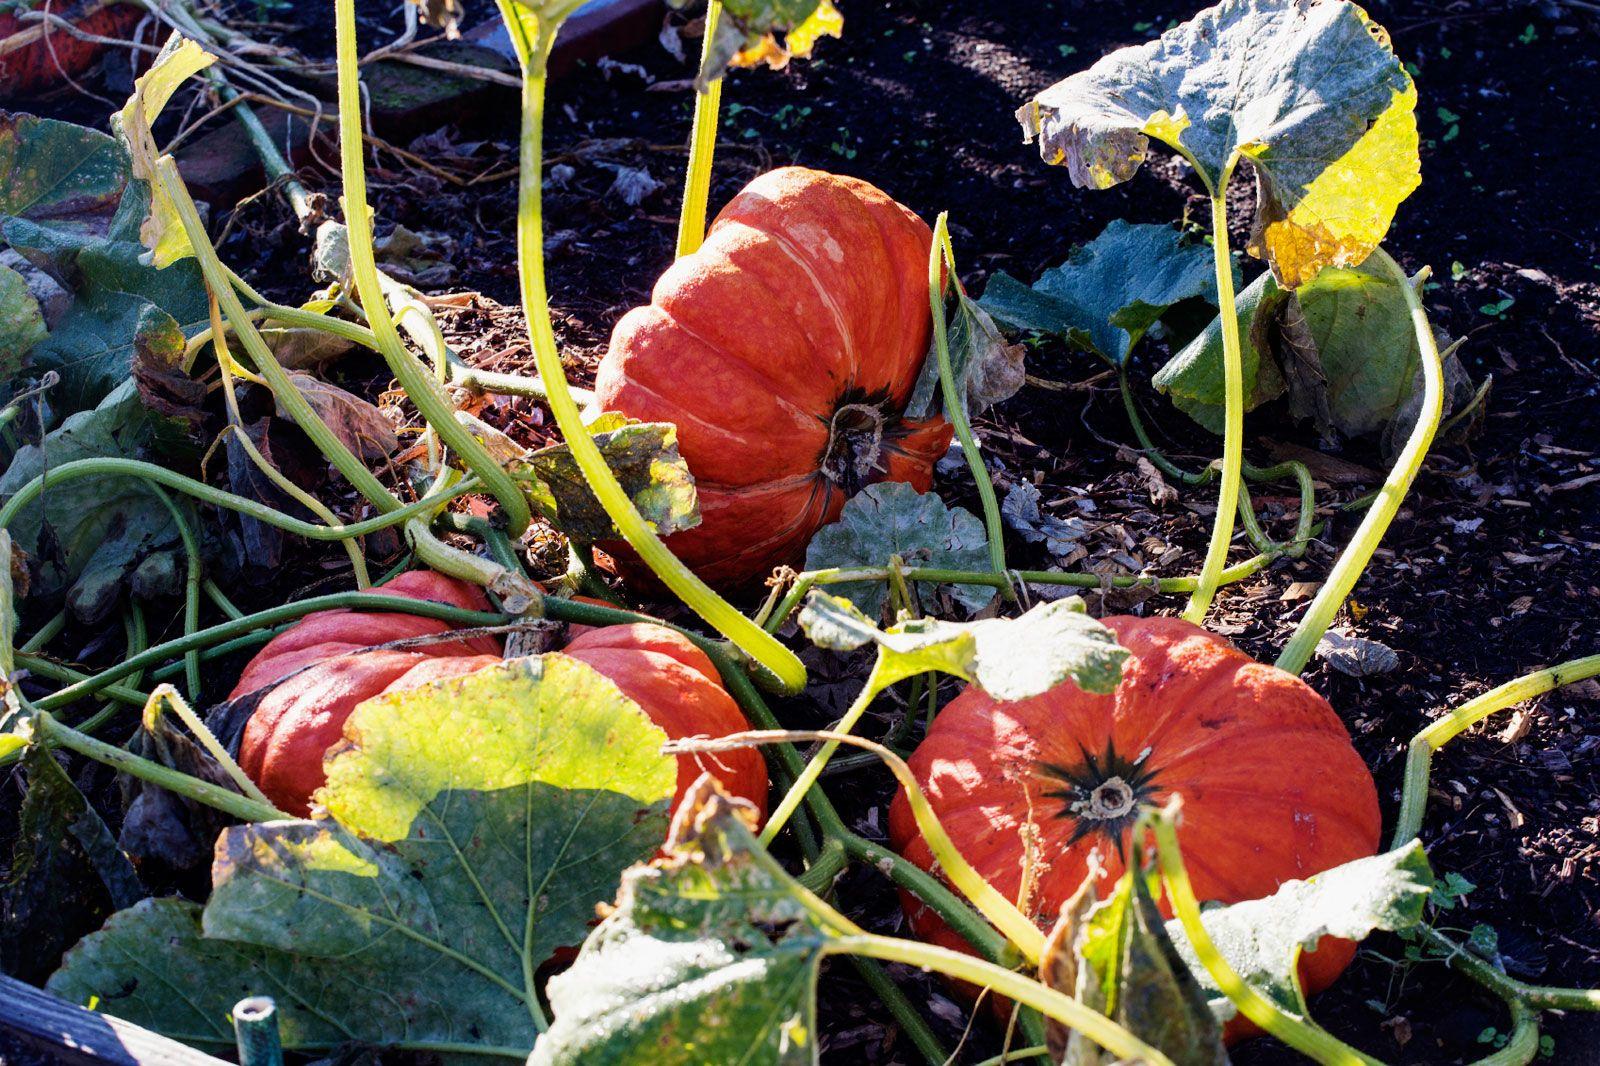 Fall garden clean up preparing a vegetable garden for - Prepare vegetable garden for winter ...